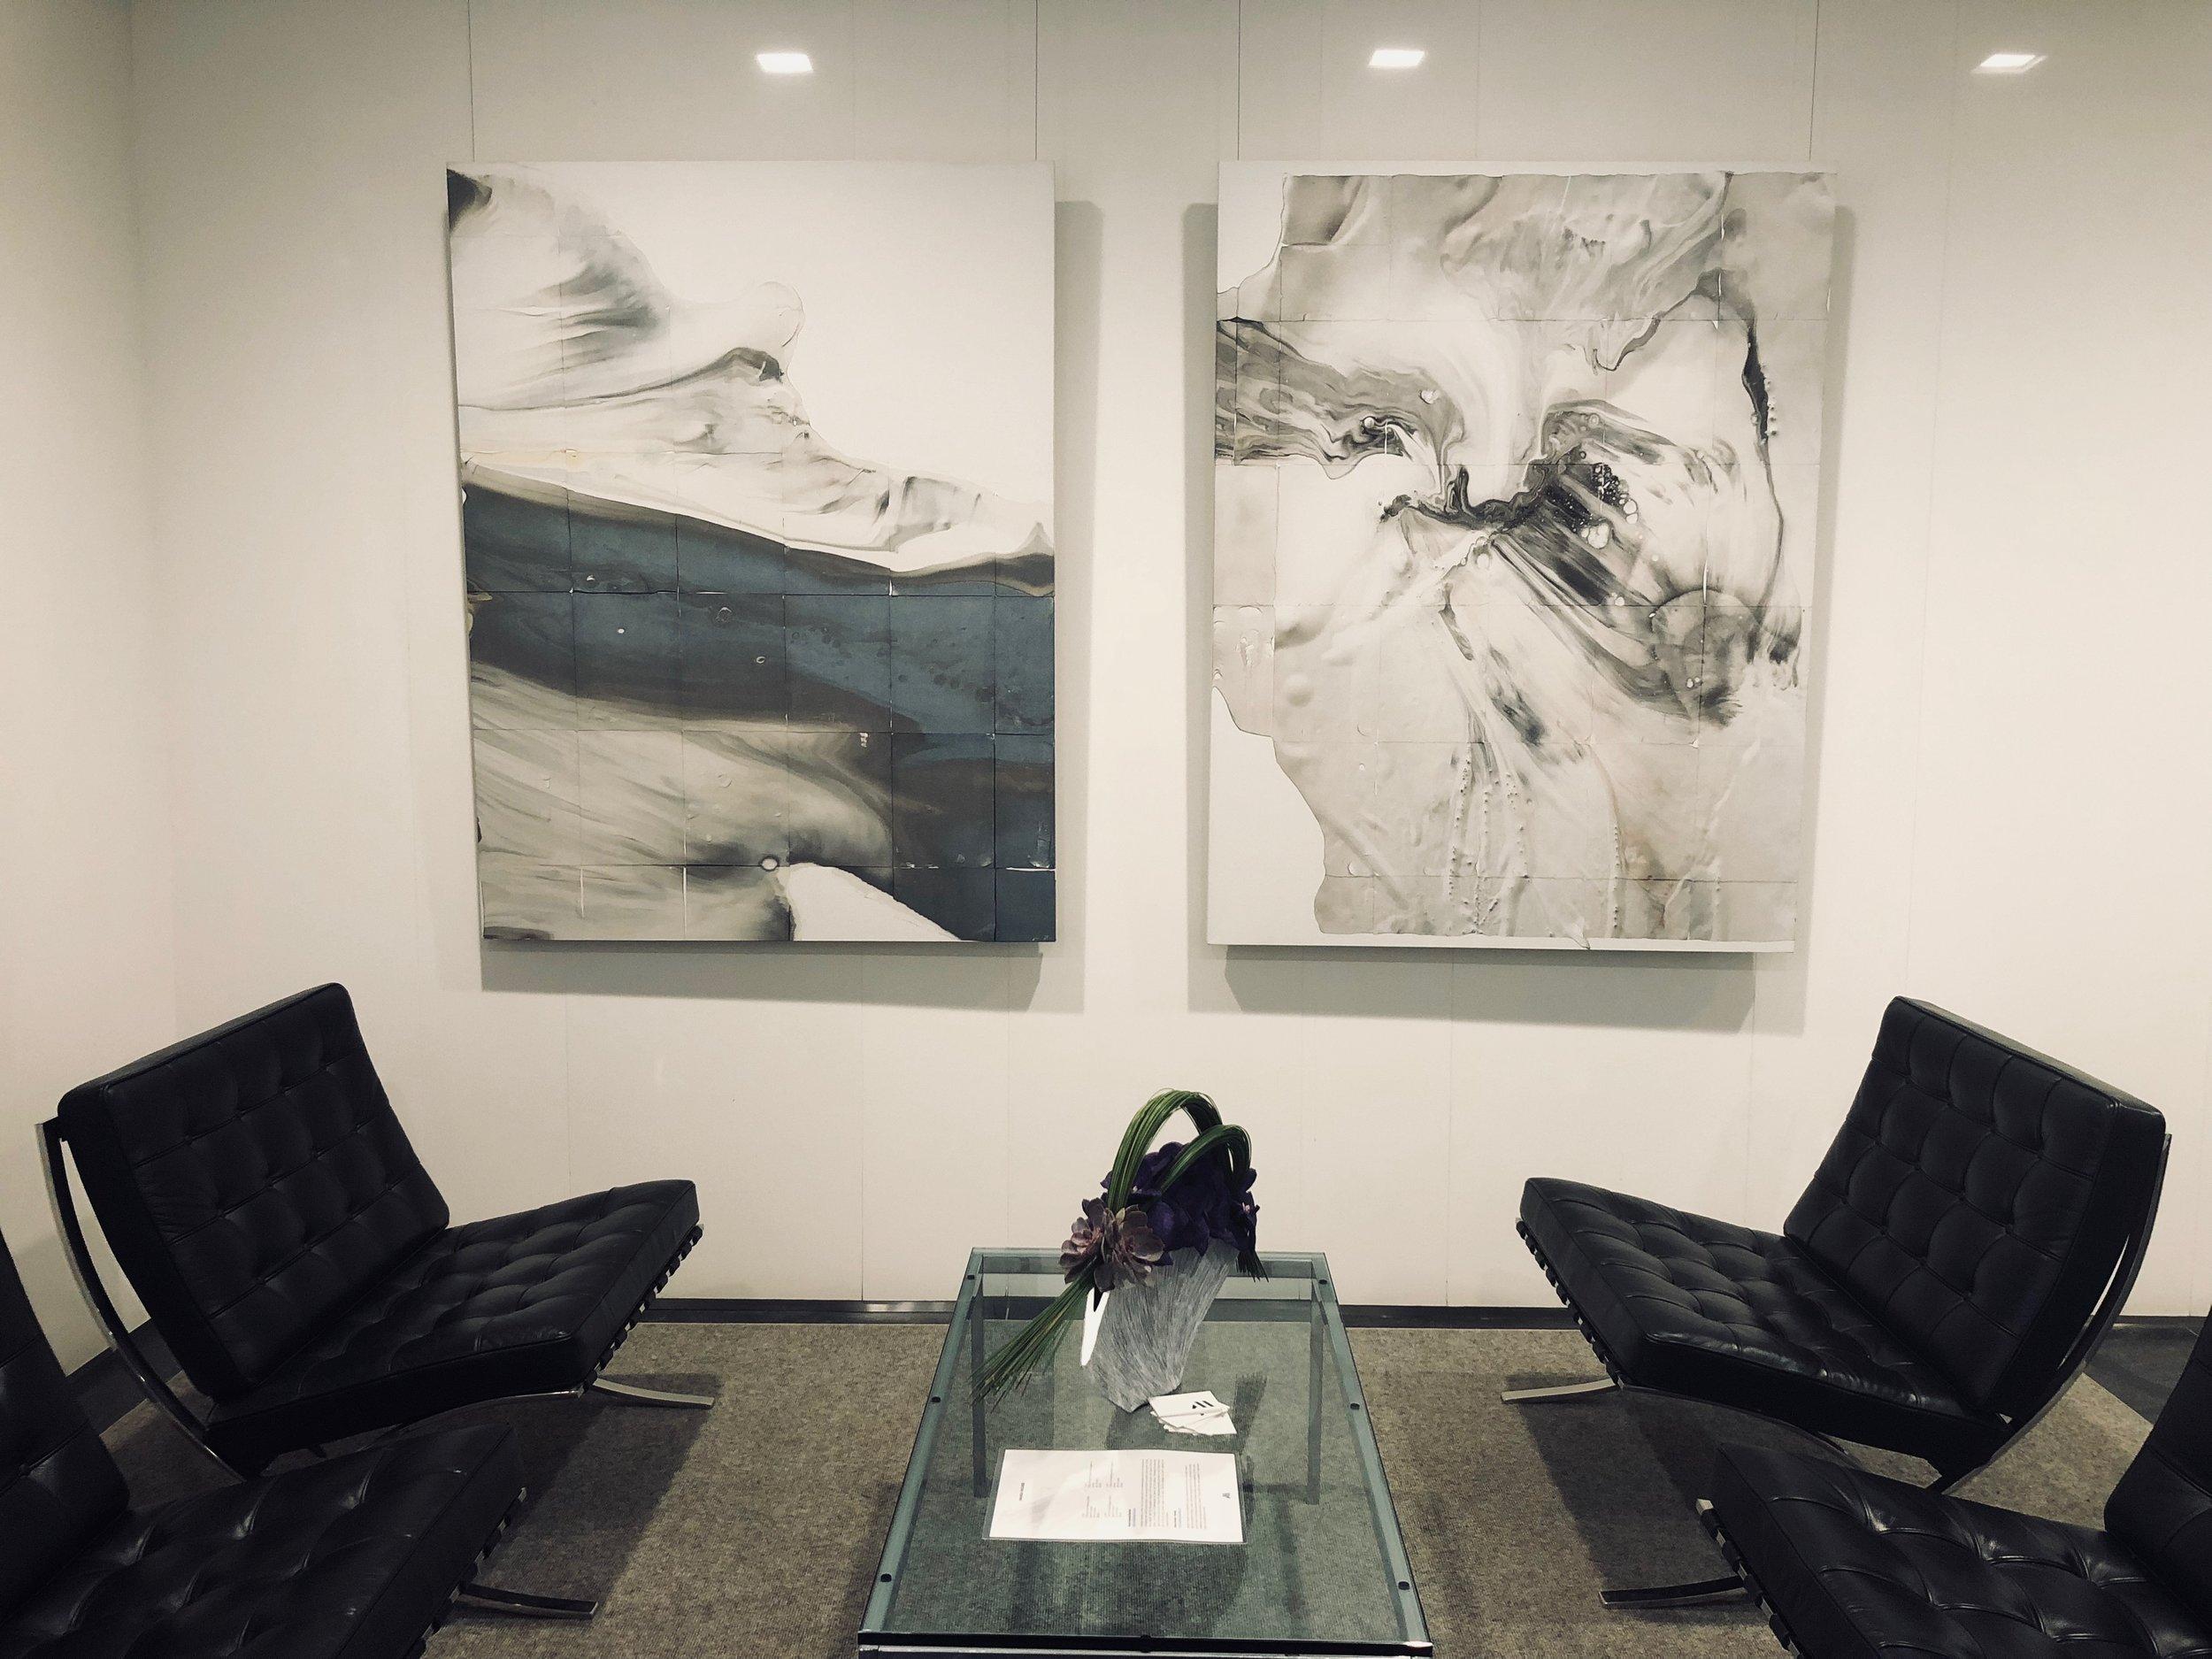 Installation View: Amanda Wachob